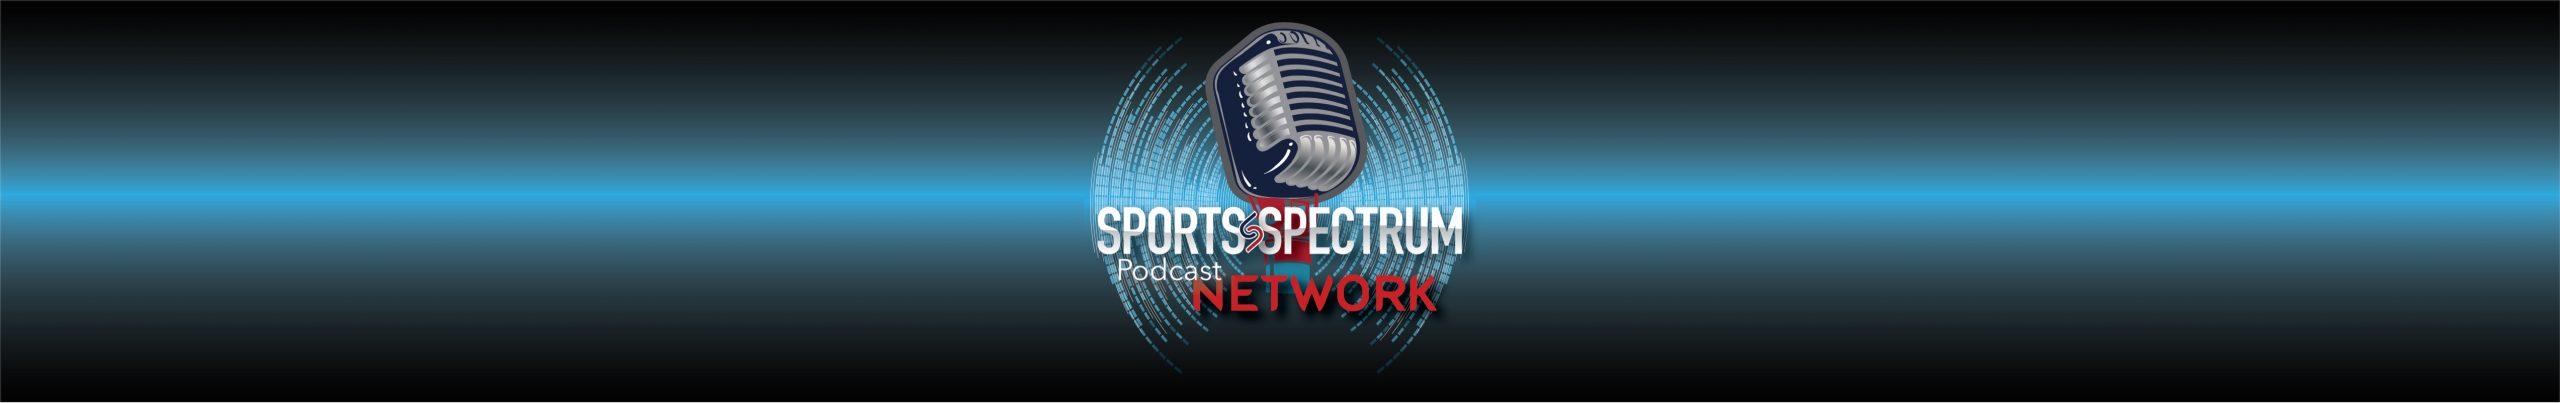 Sports Spectrum Podcast Network